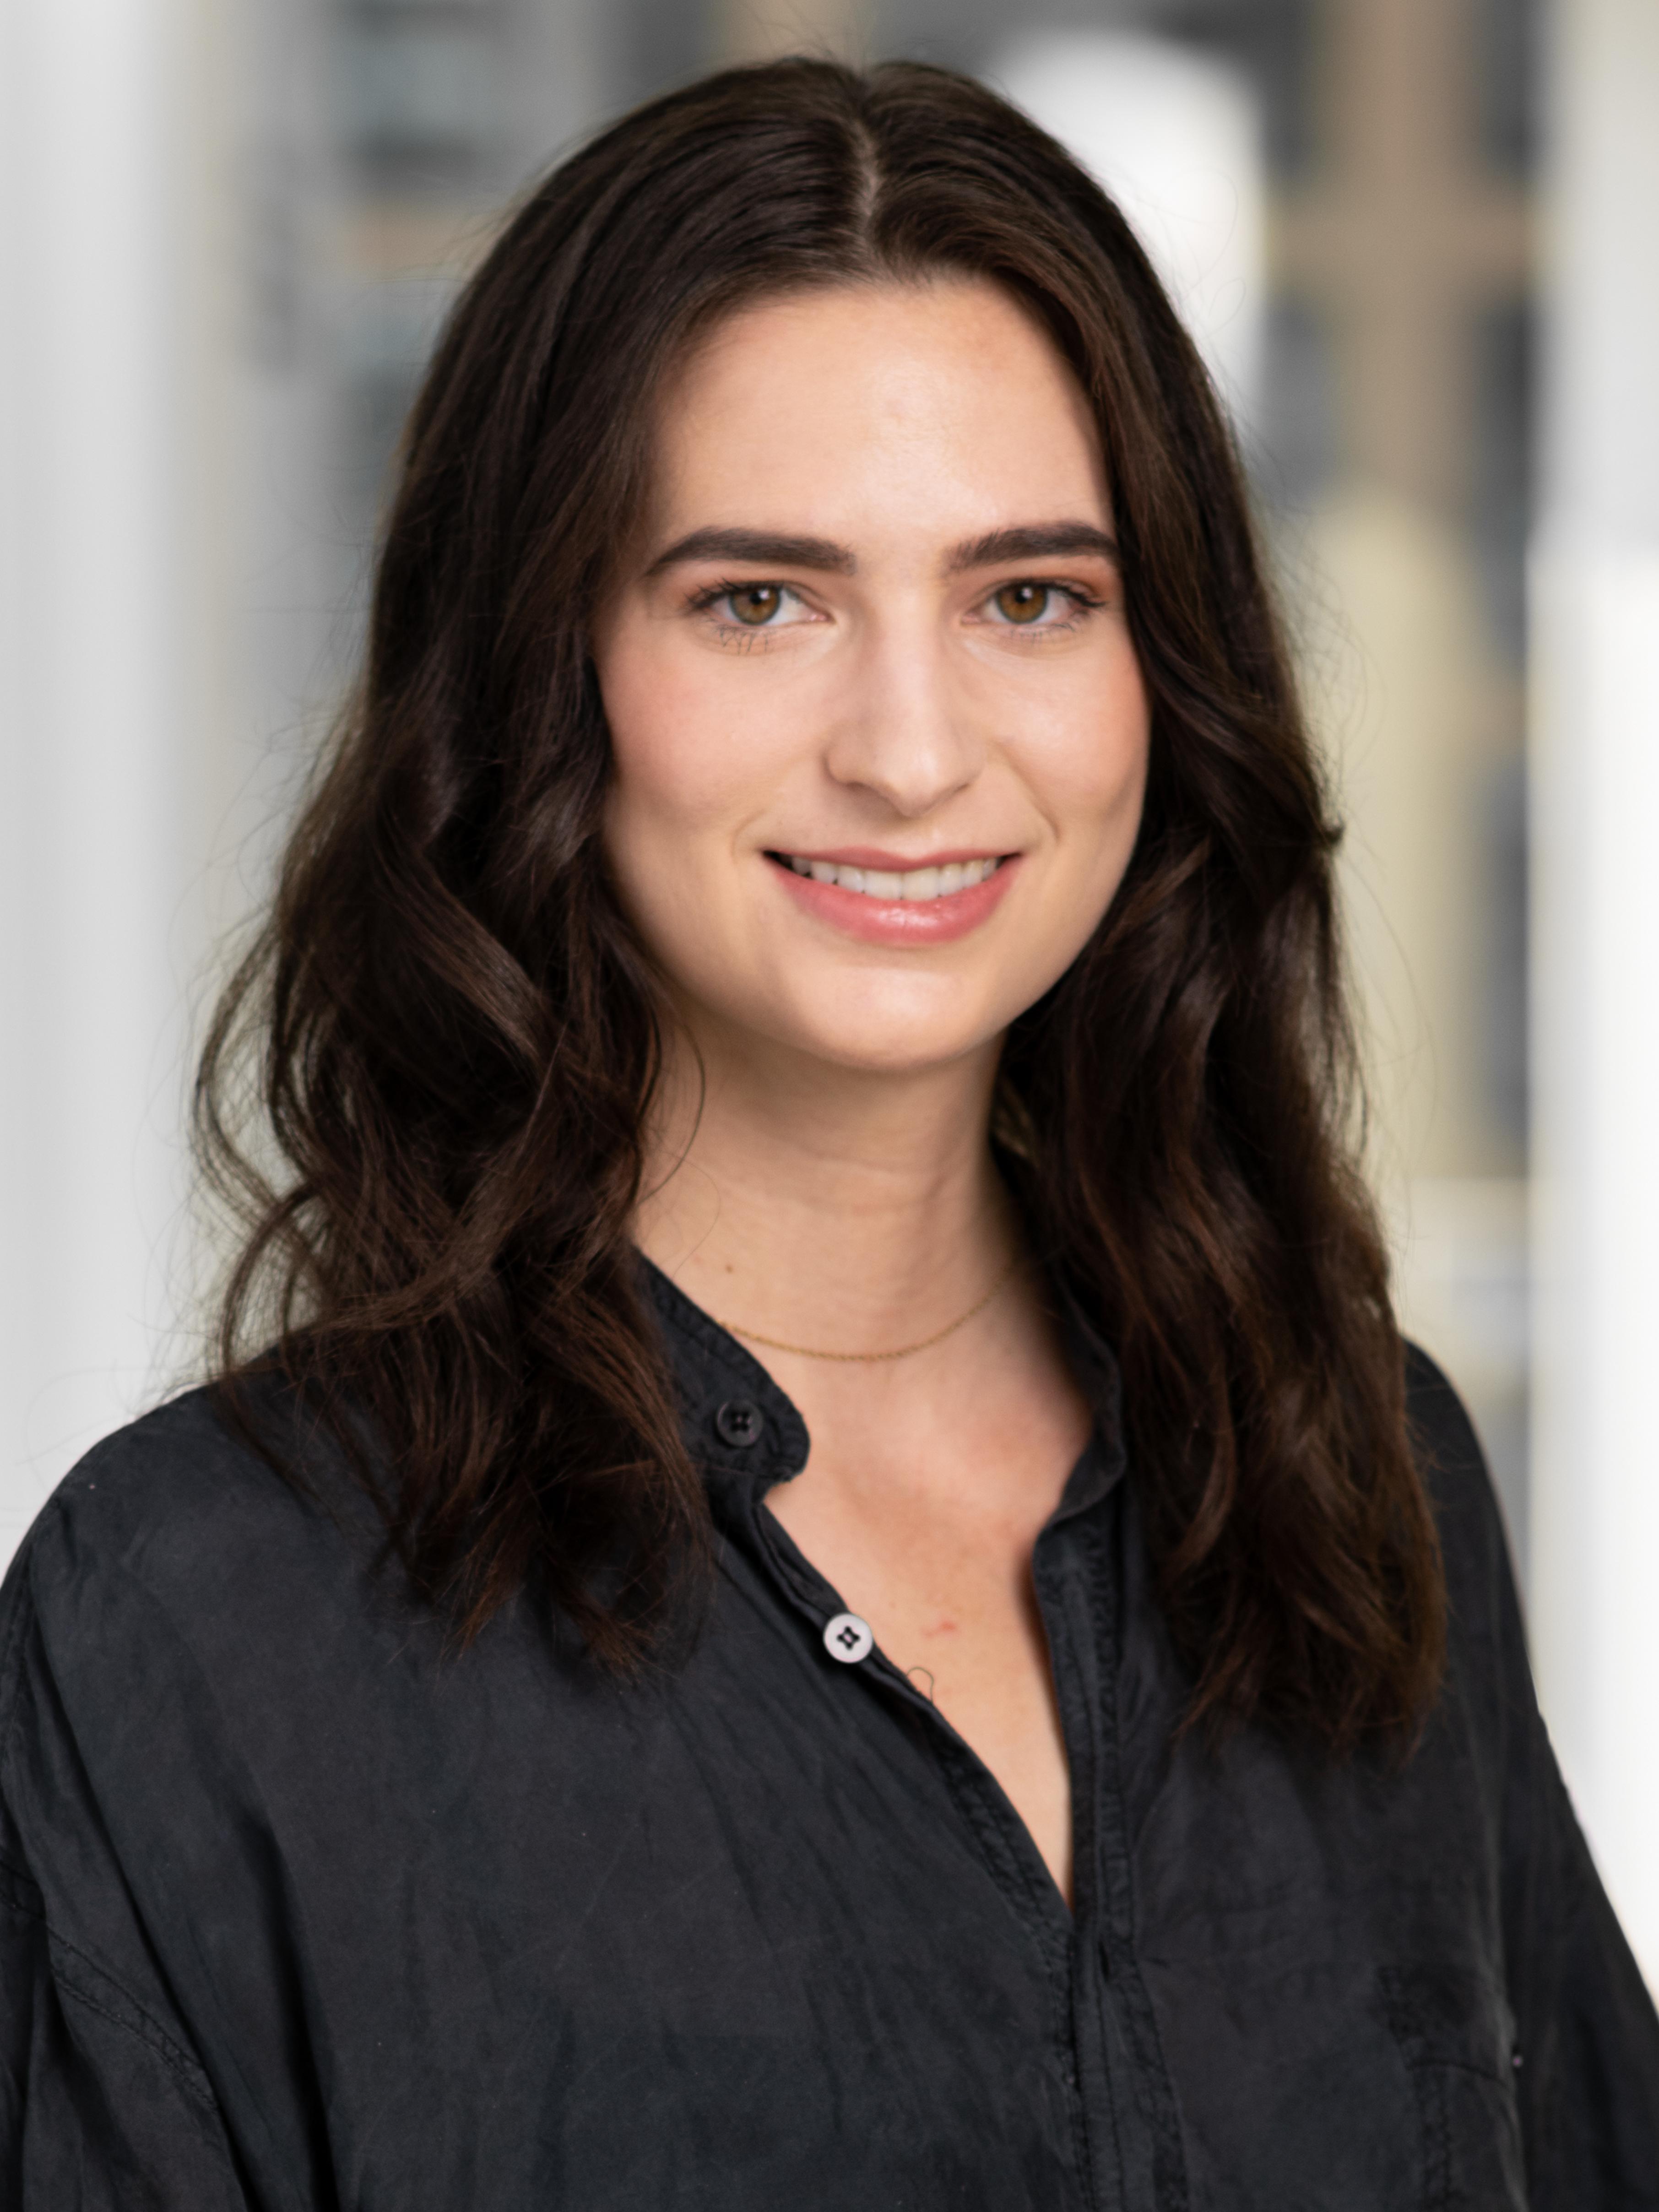 Emma Bowman | WHQR